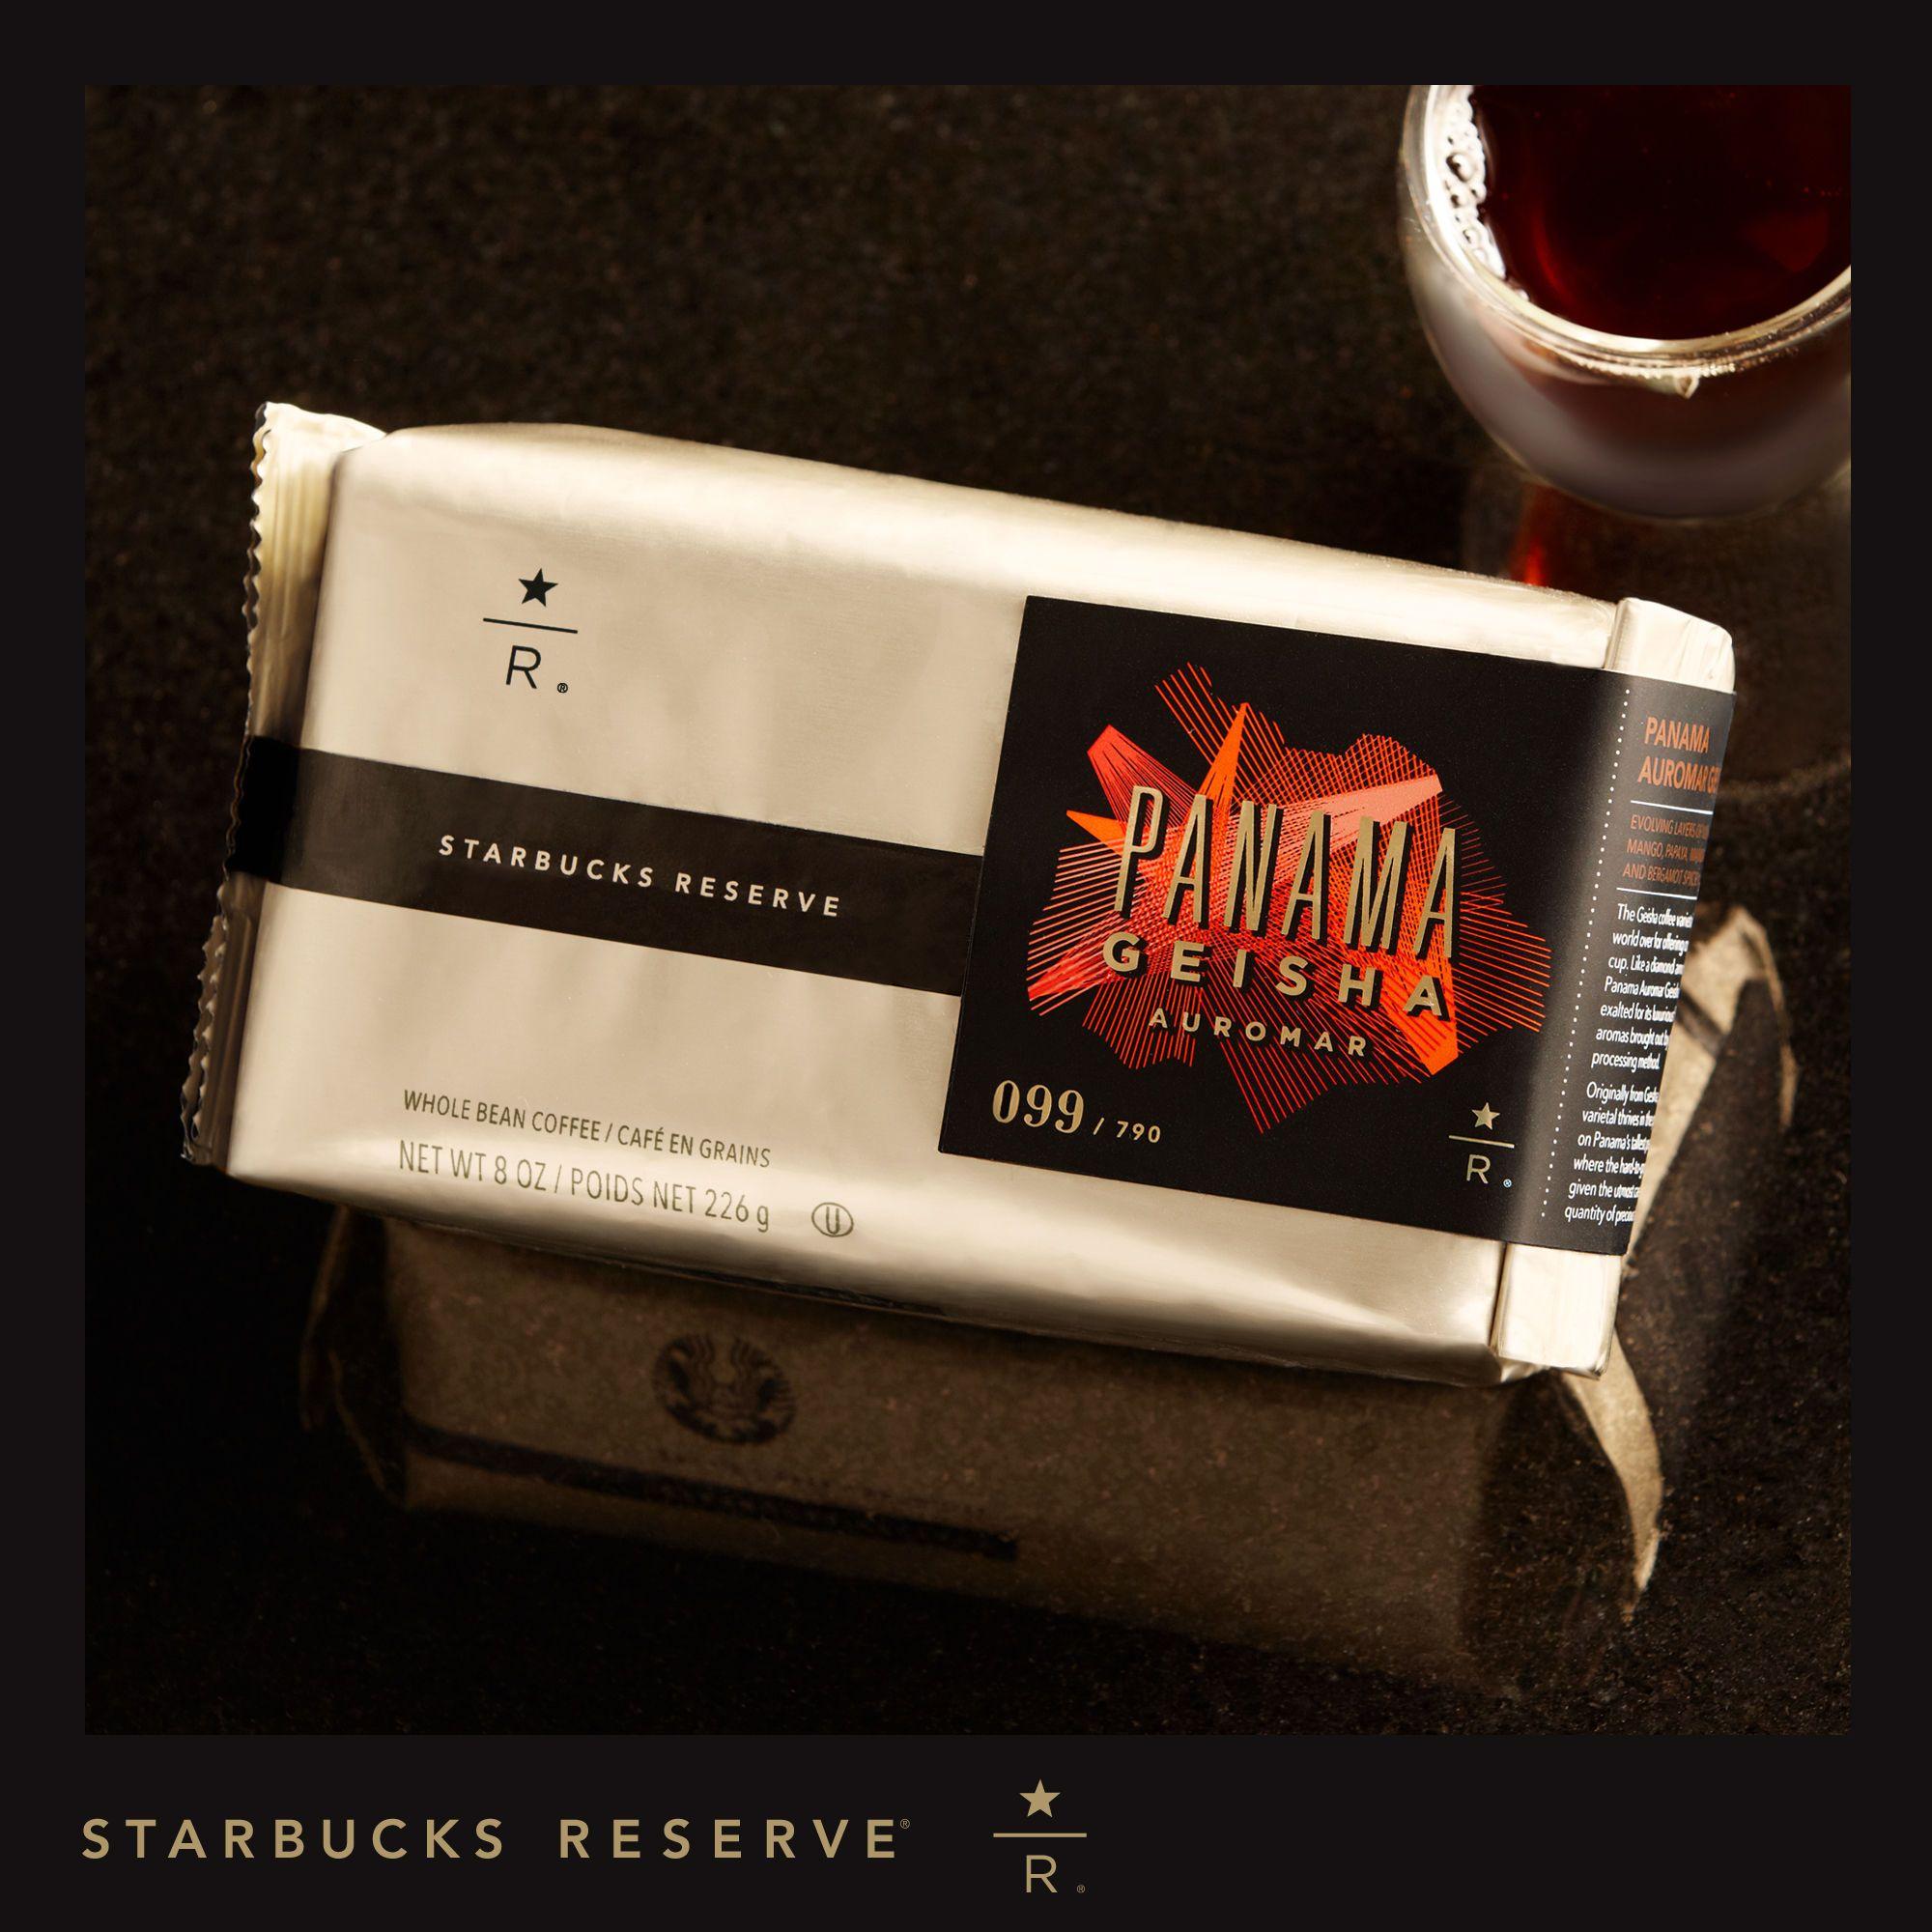 50 Starbucks Reserve Panama Geisha Auromar A Little Something